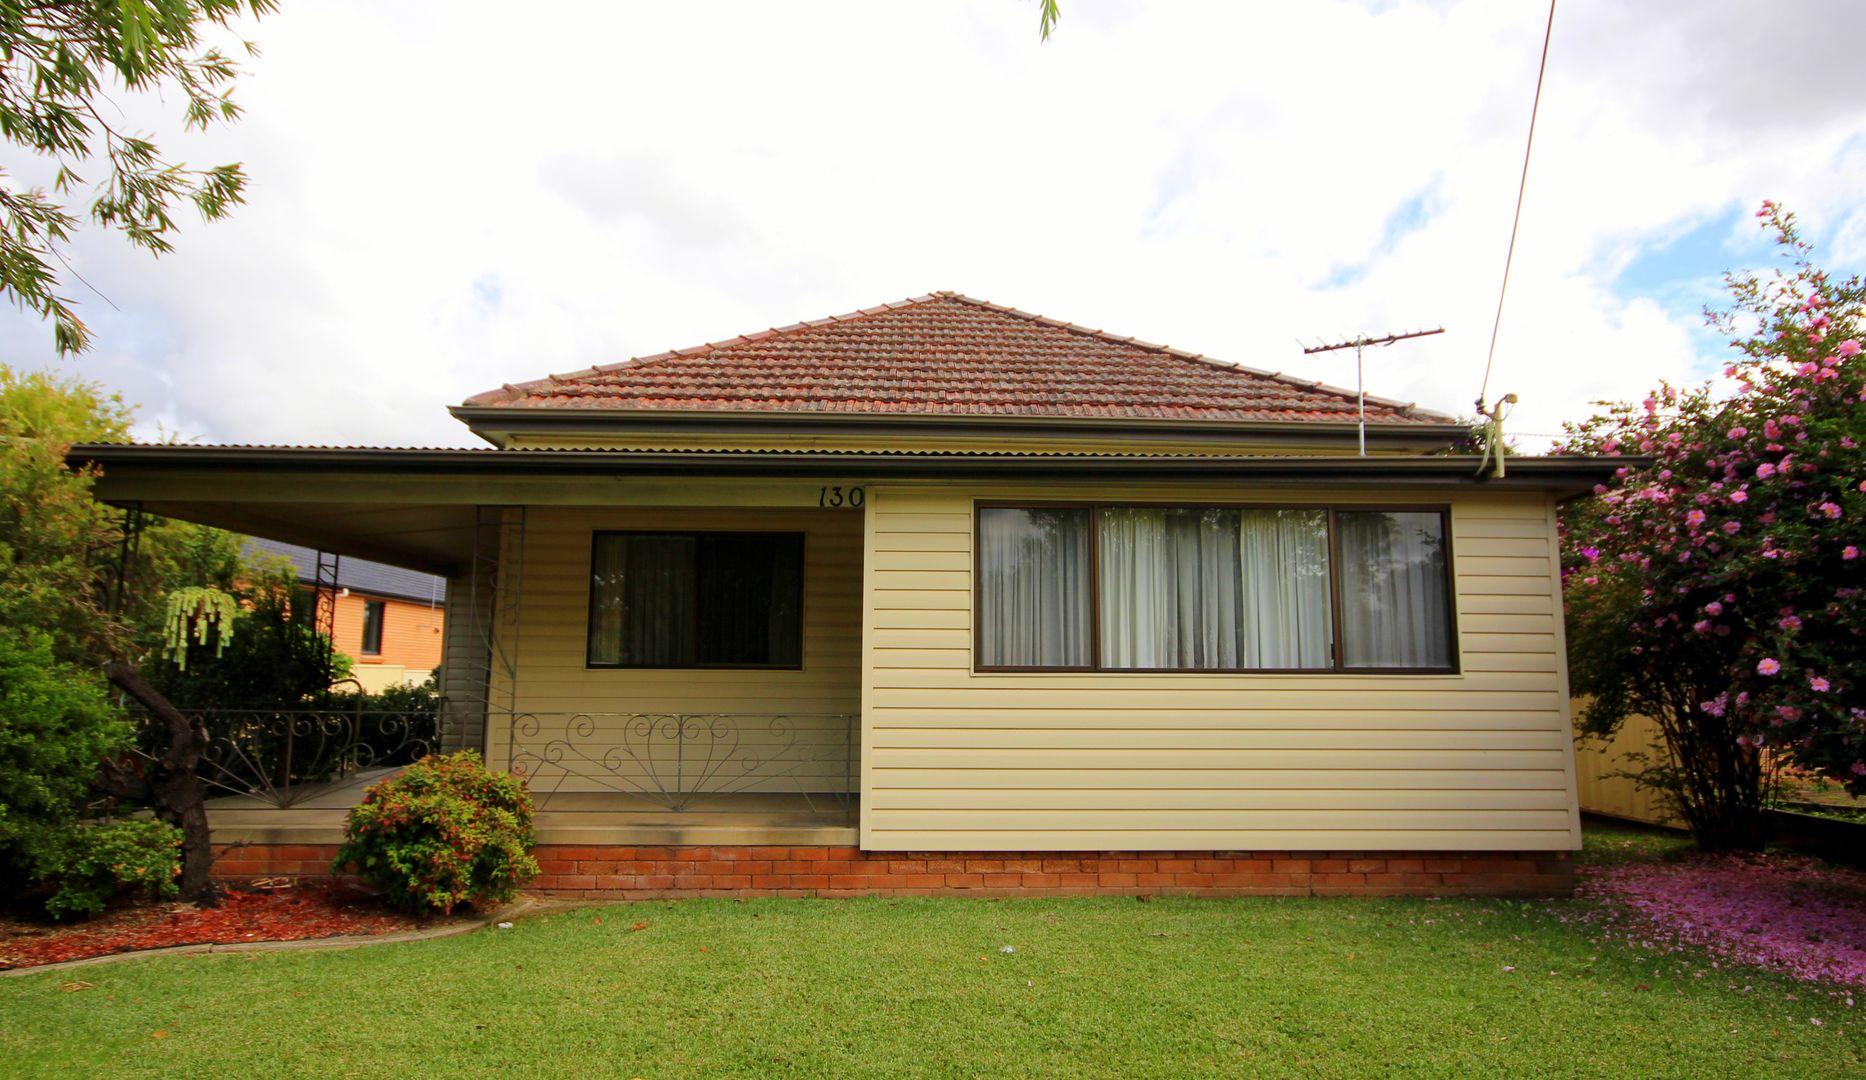 130 Stacey Street, Bankstown NSW 2200, Image 0